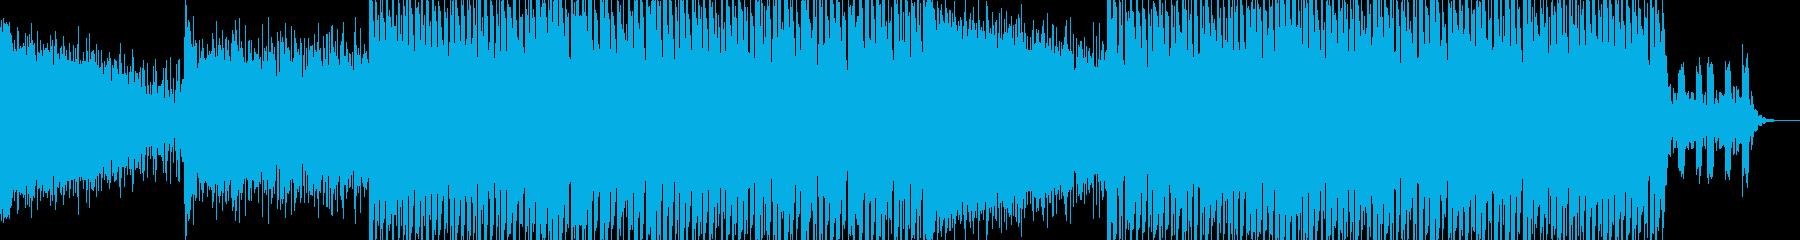 EDMクラブ系ダンスミュージック-79の再生済みの波形